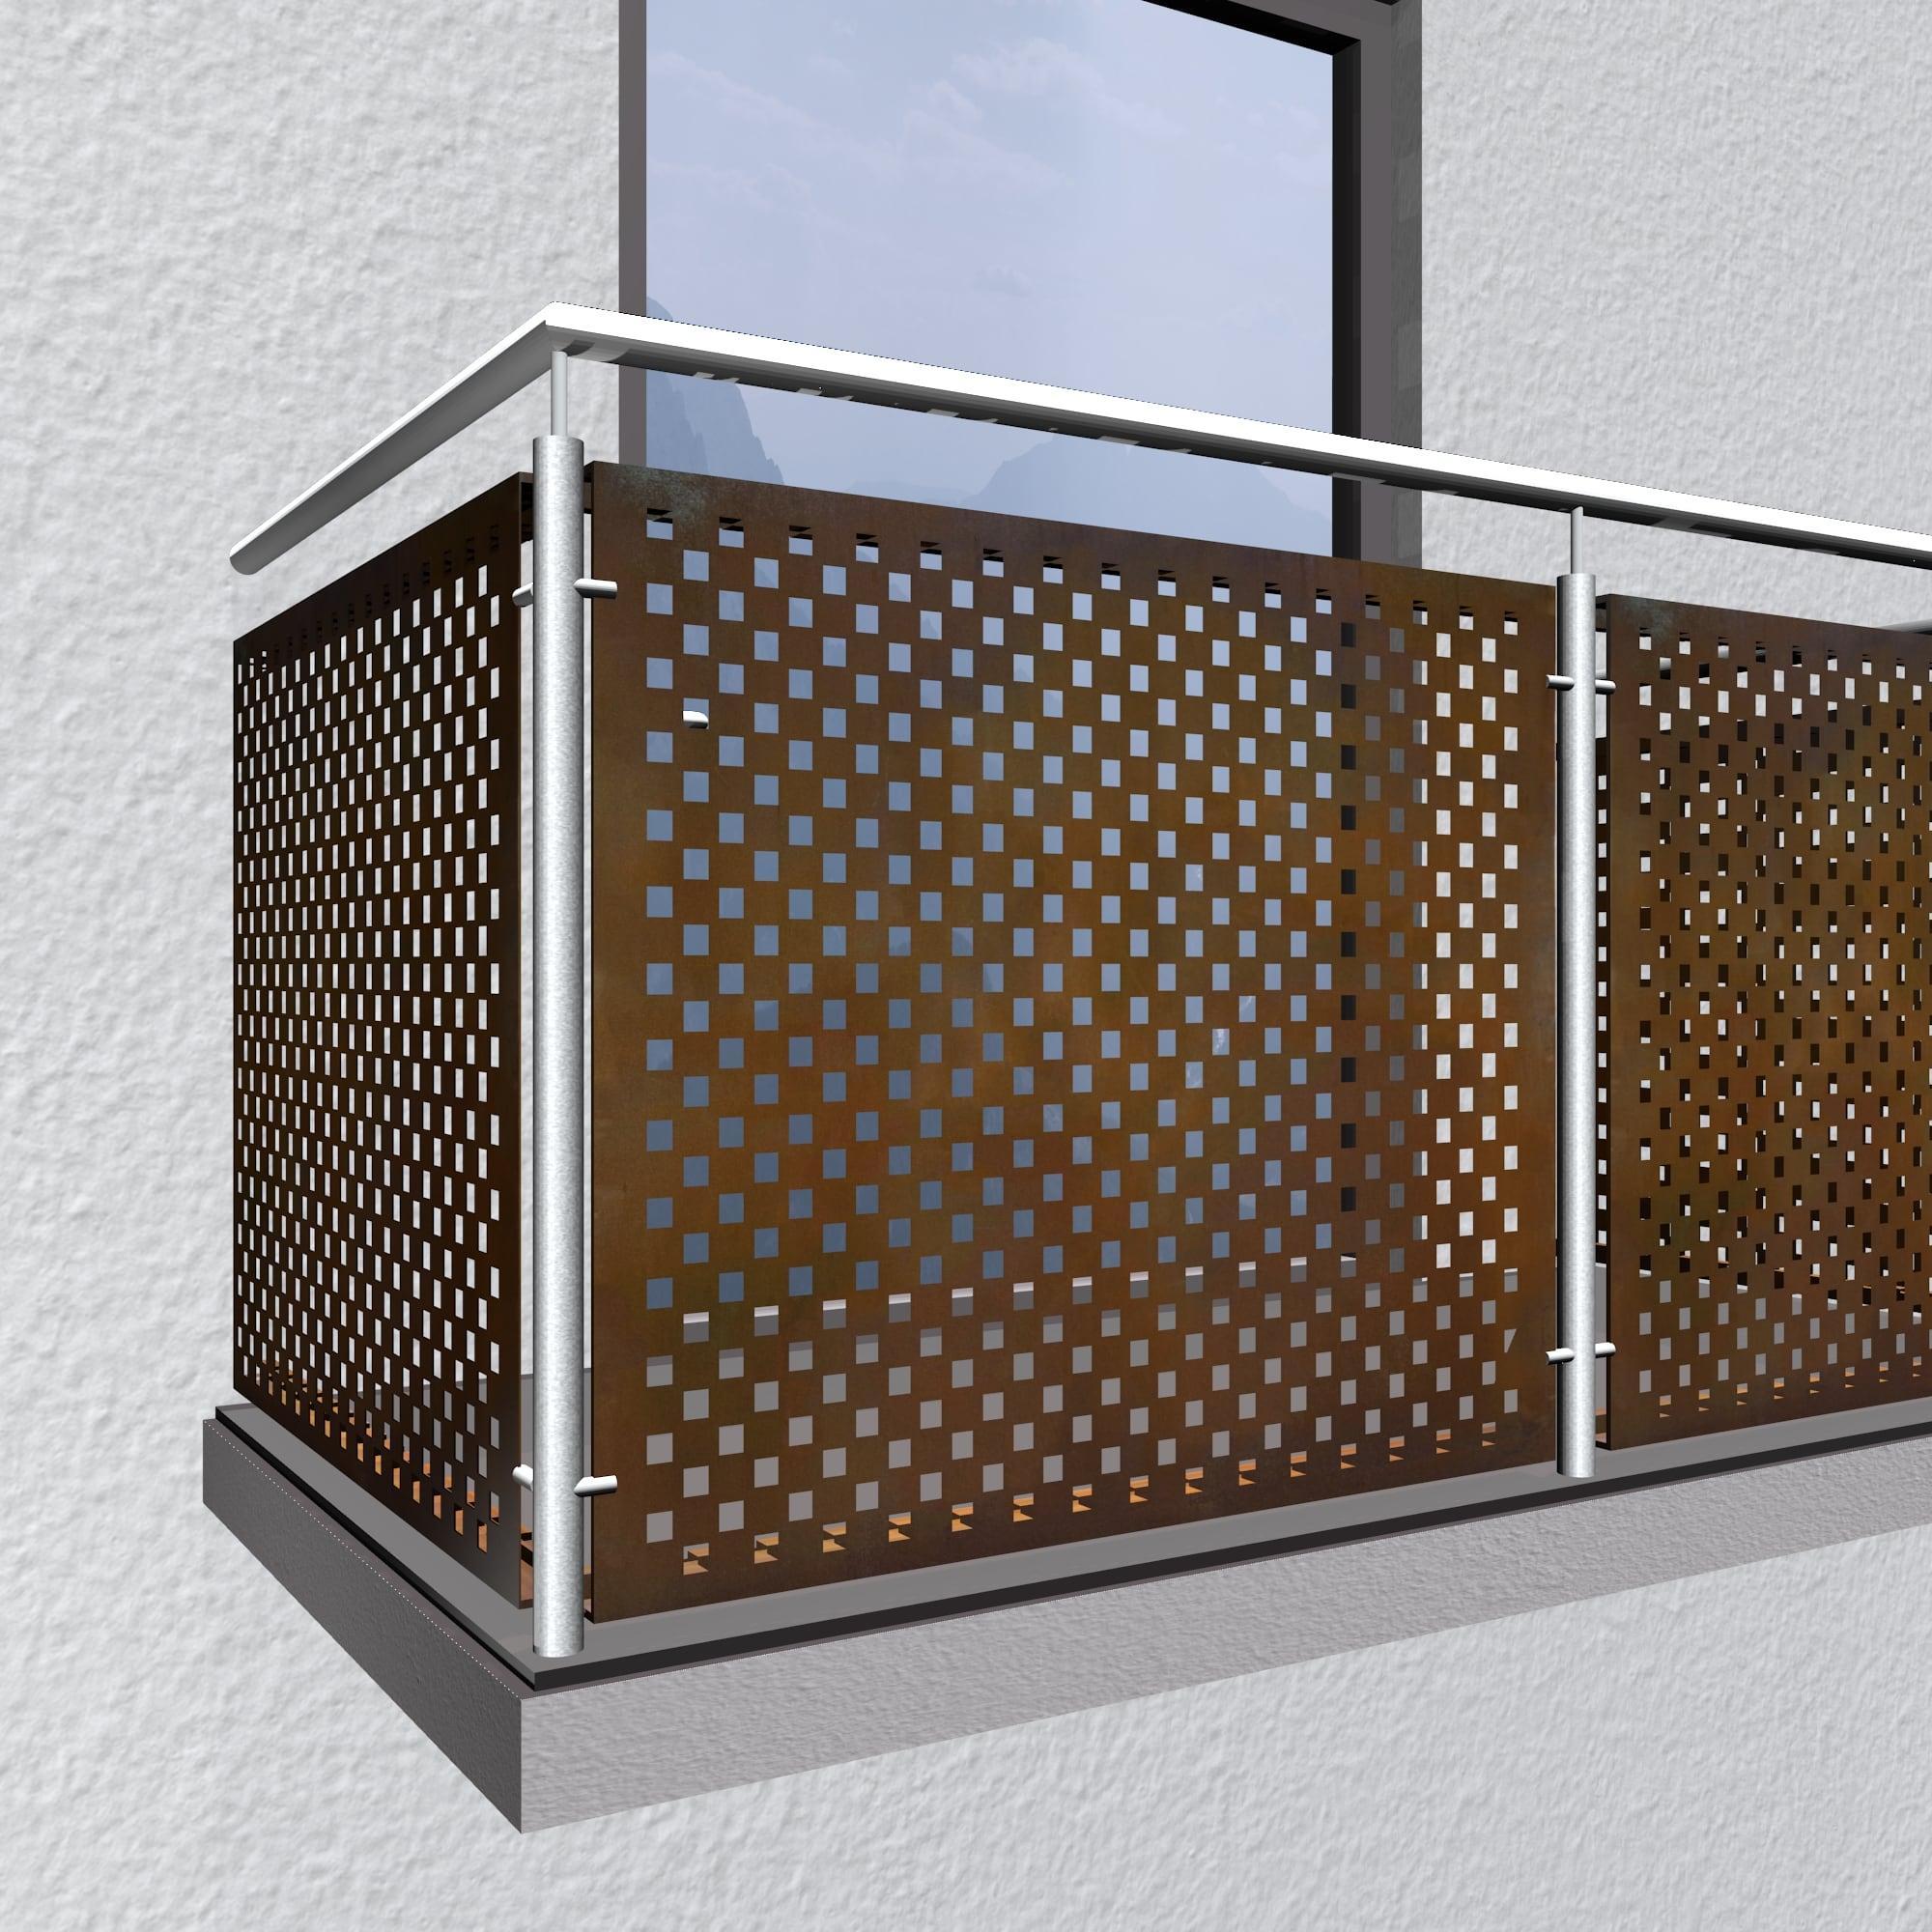 Balkonverkleidung Cortenstahl QL VE